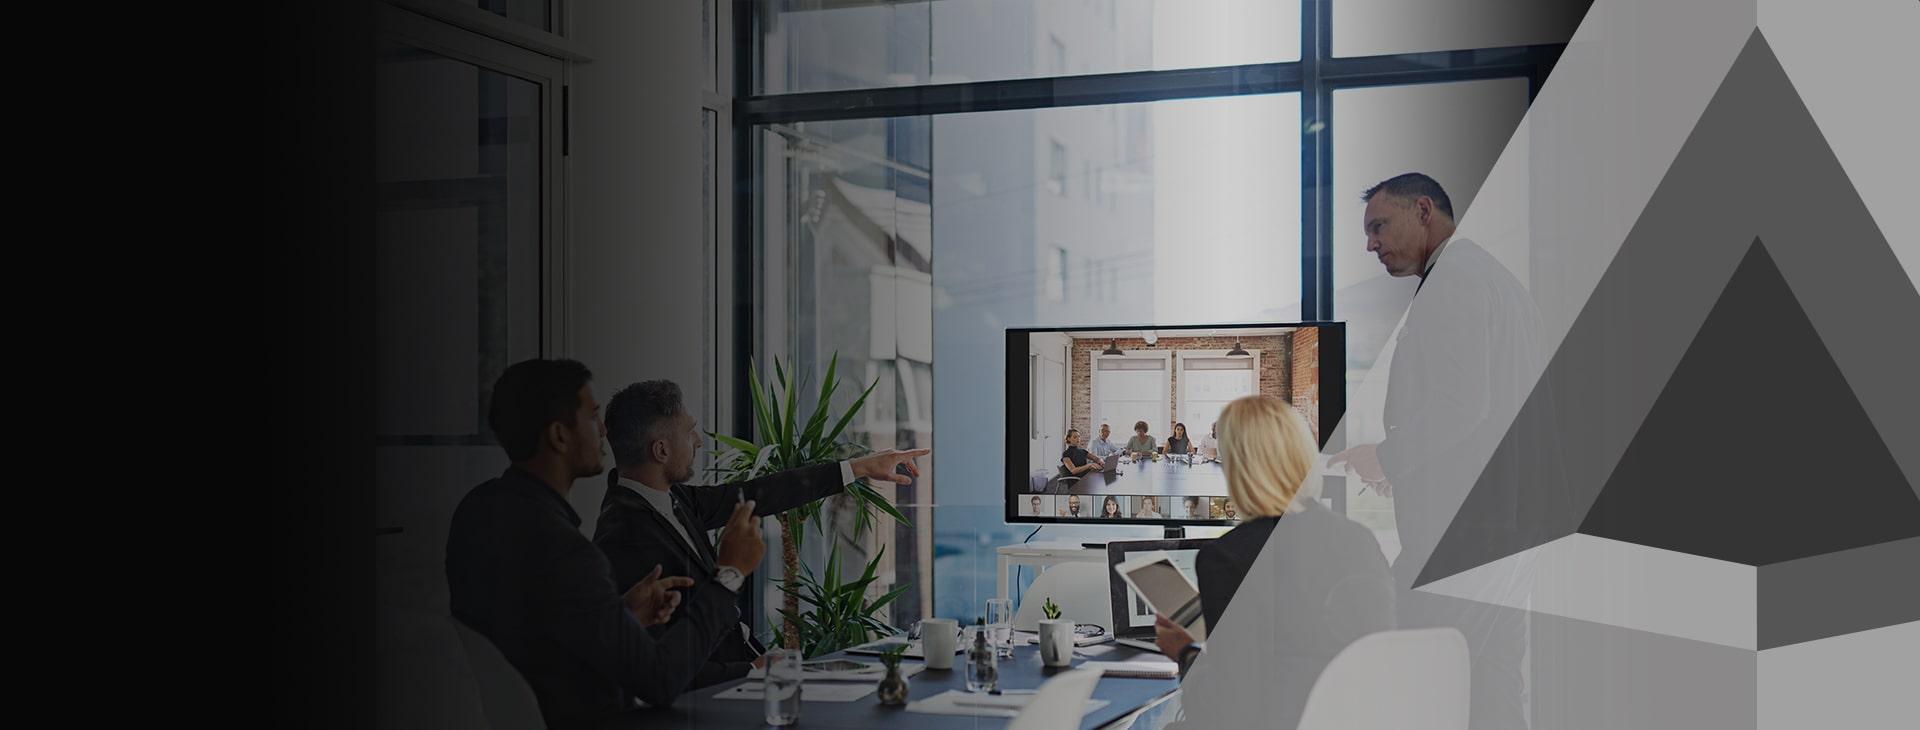 Corporate presentation technologies